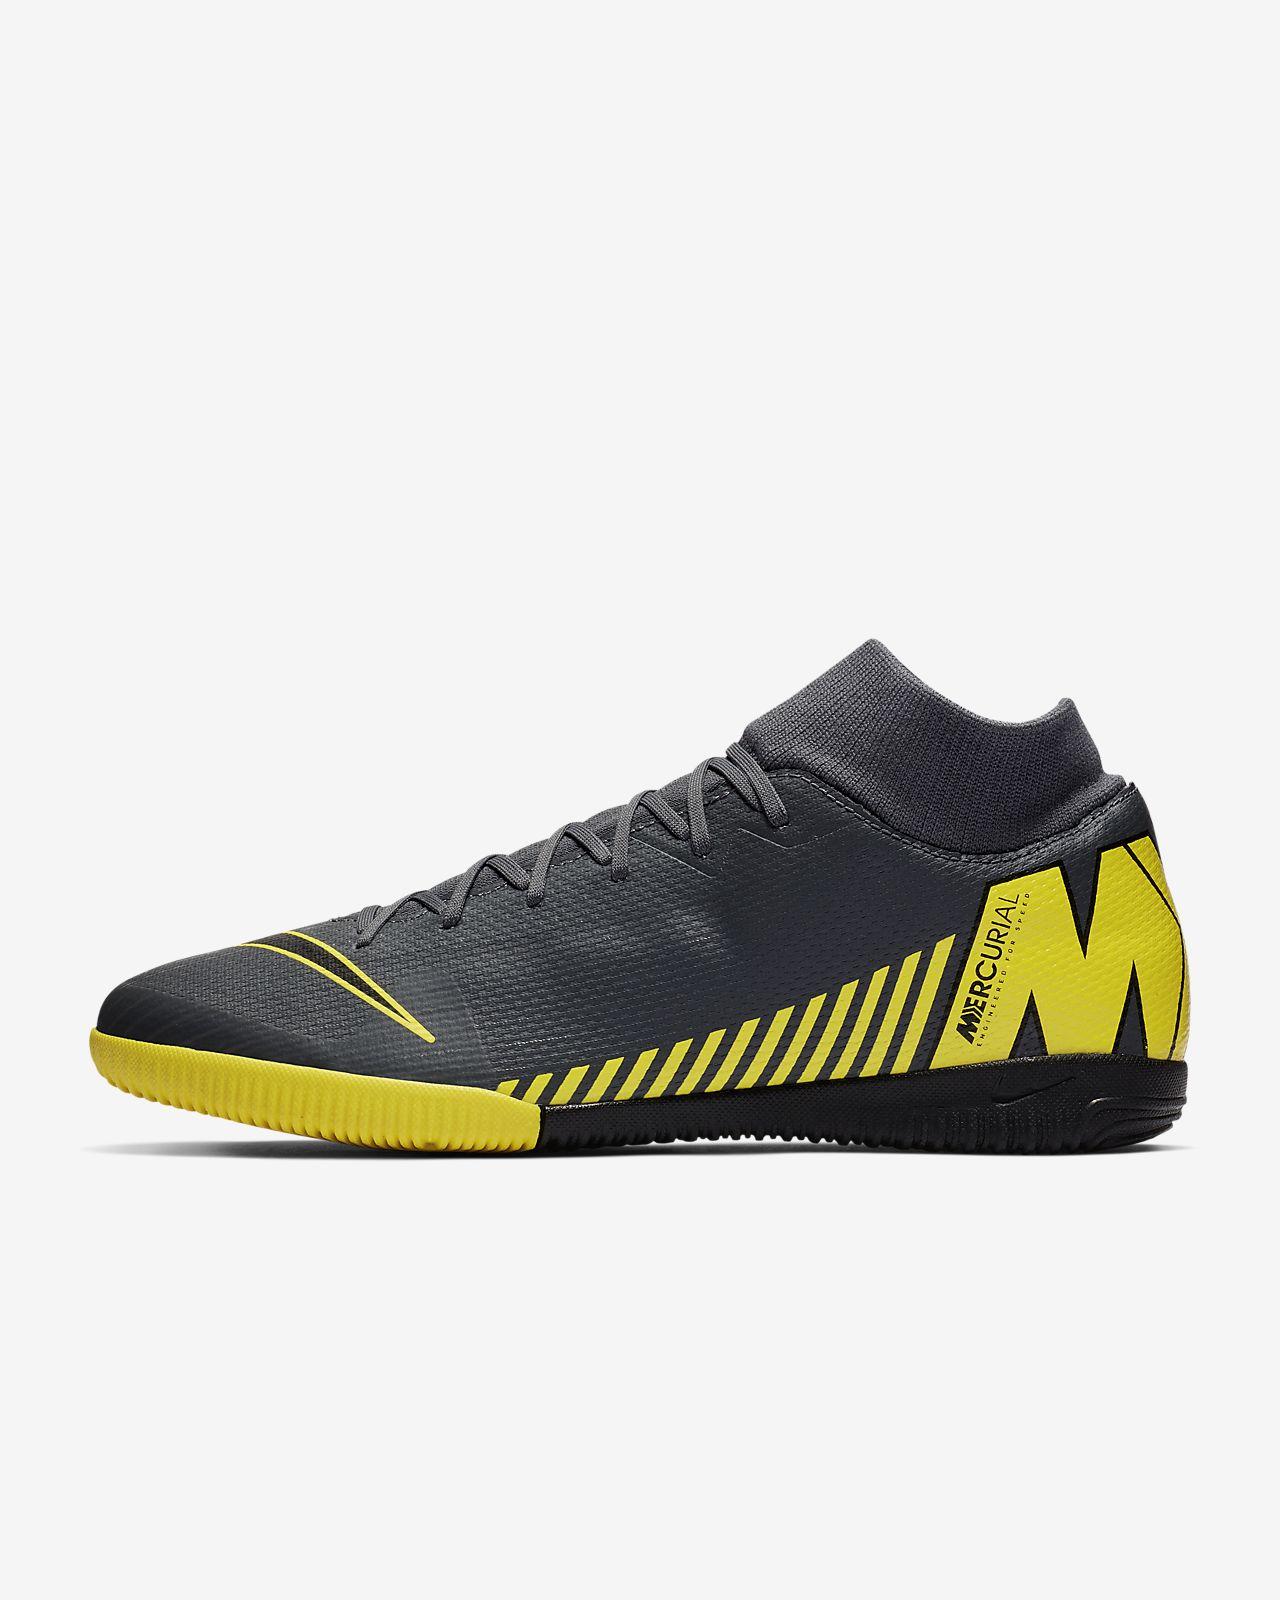 new concept 462cc f26cd ... Chaussure de football en salle à crampons Nike SuperflyX 6 Academy IC